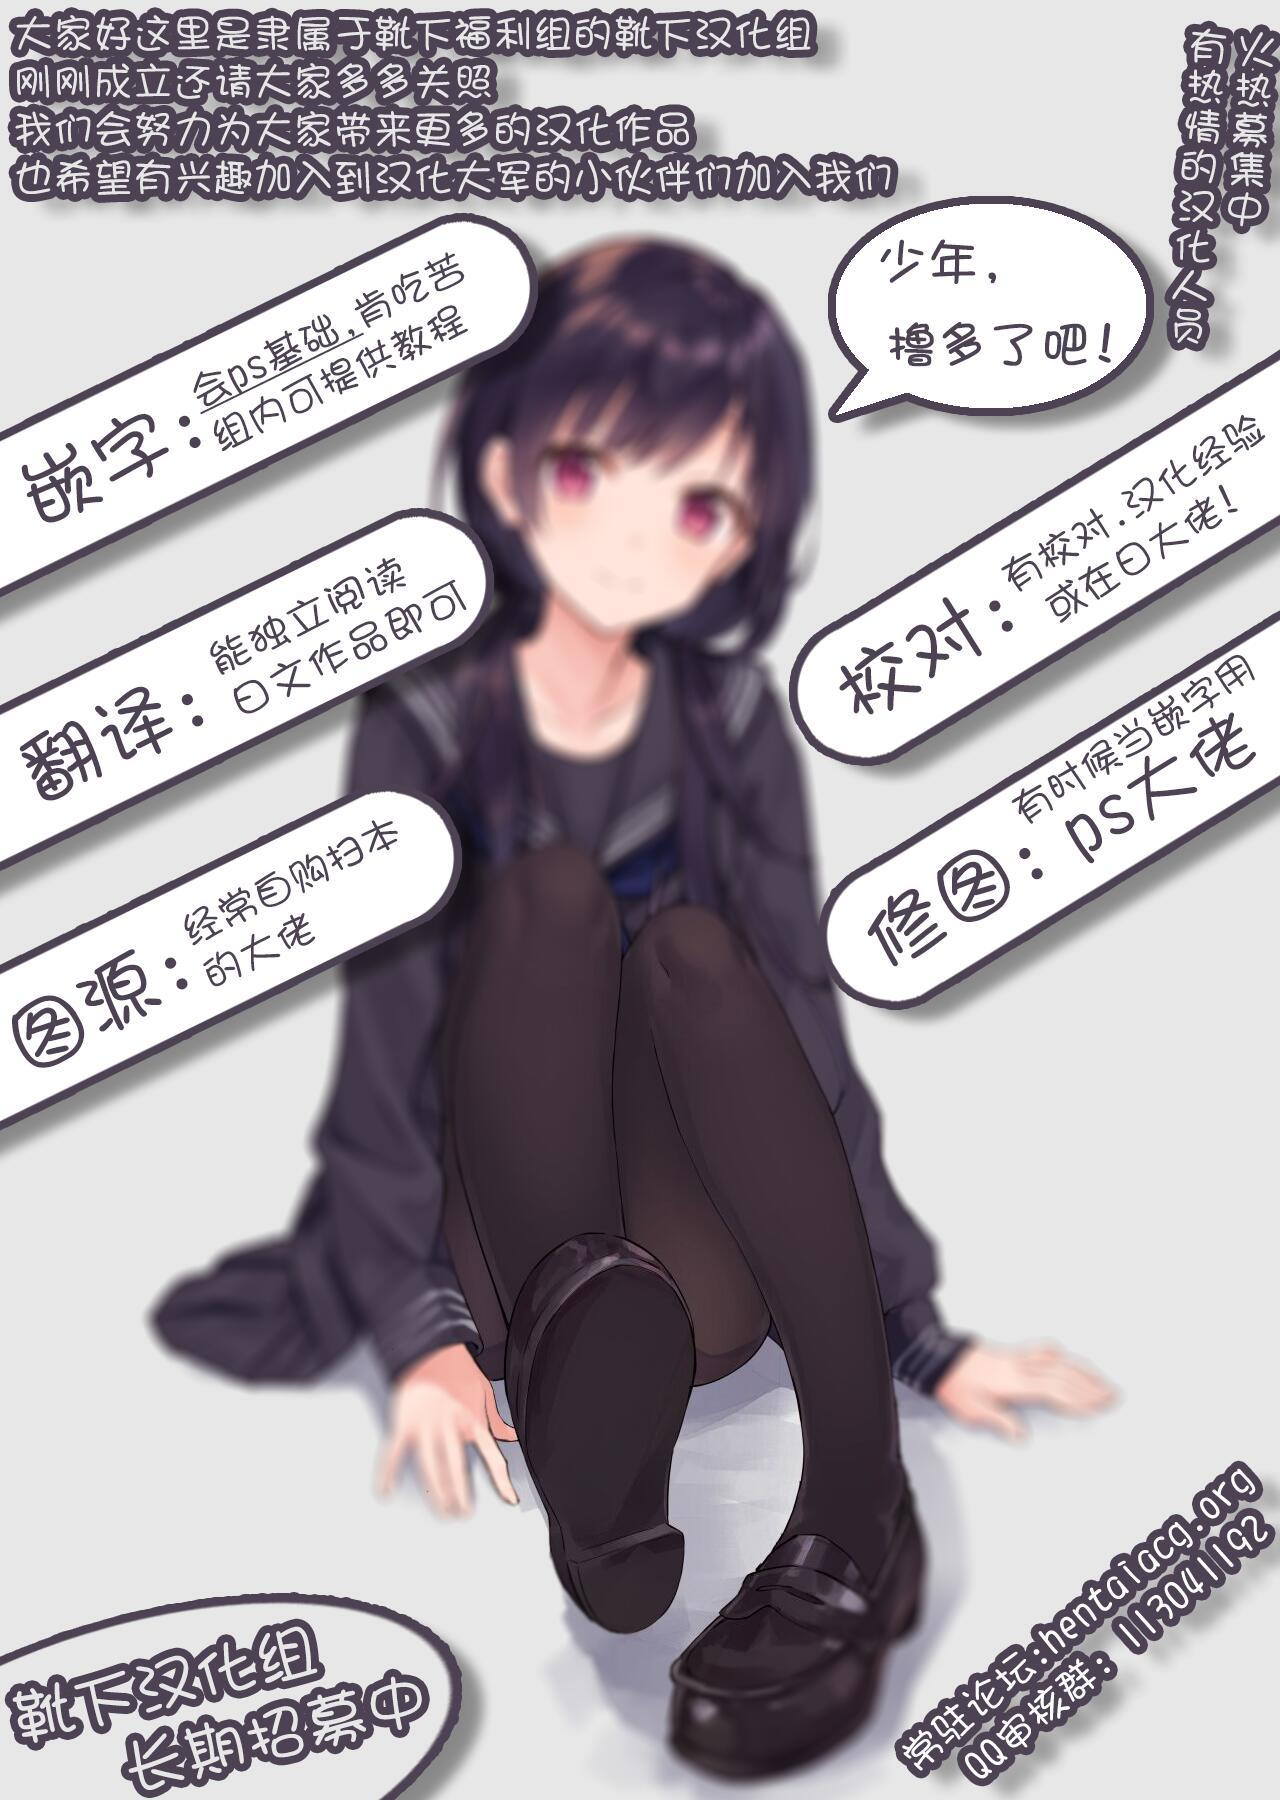 Maya-sama Ero Sugiru. 17